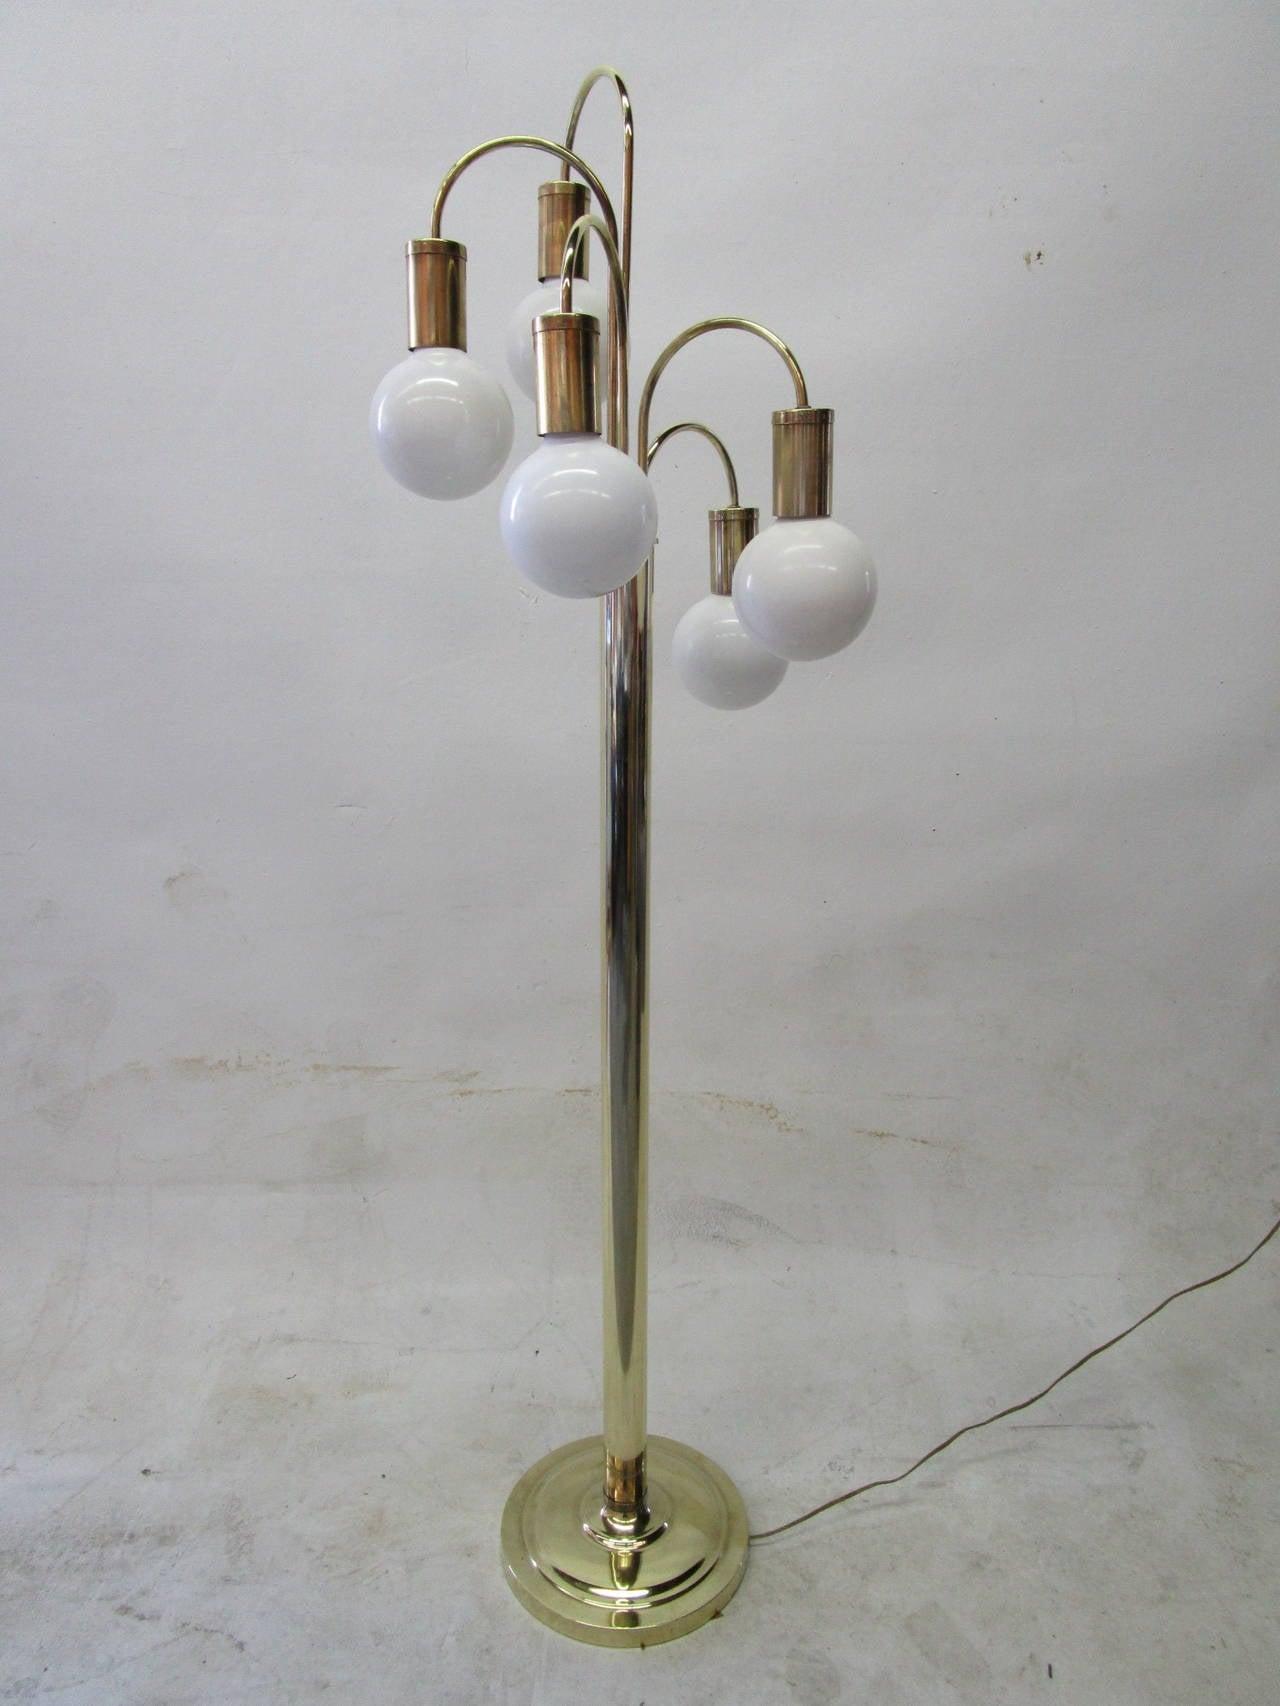 Waterfall Five-Arm Brass  Floor Lamp by Robert Sonneman 2